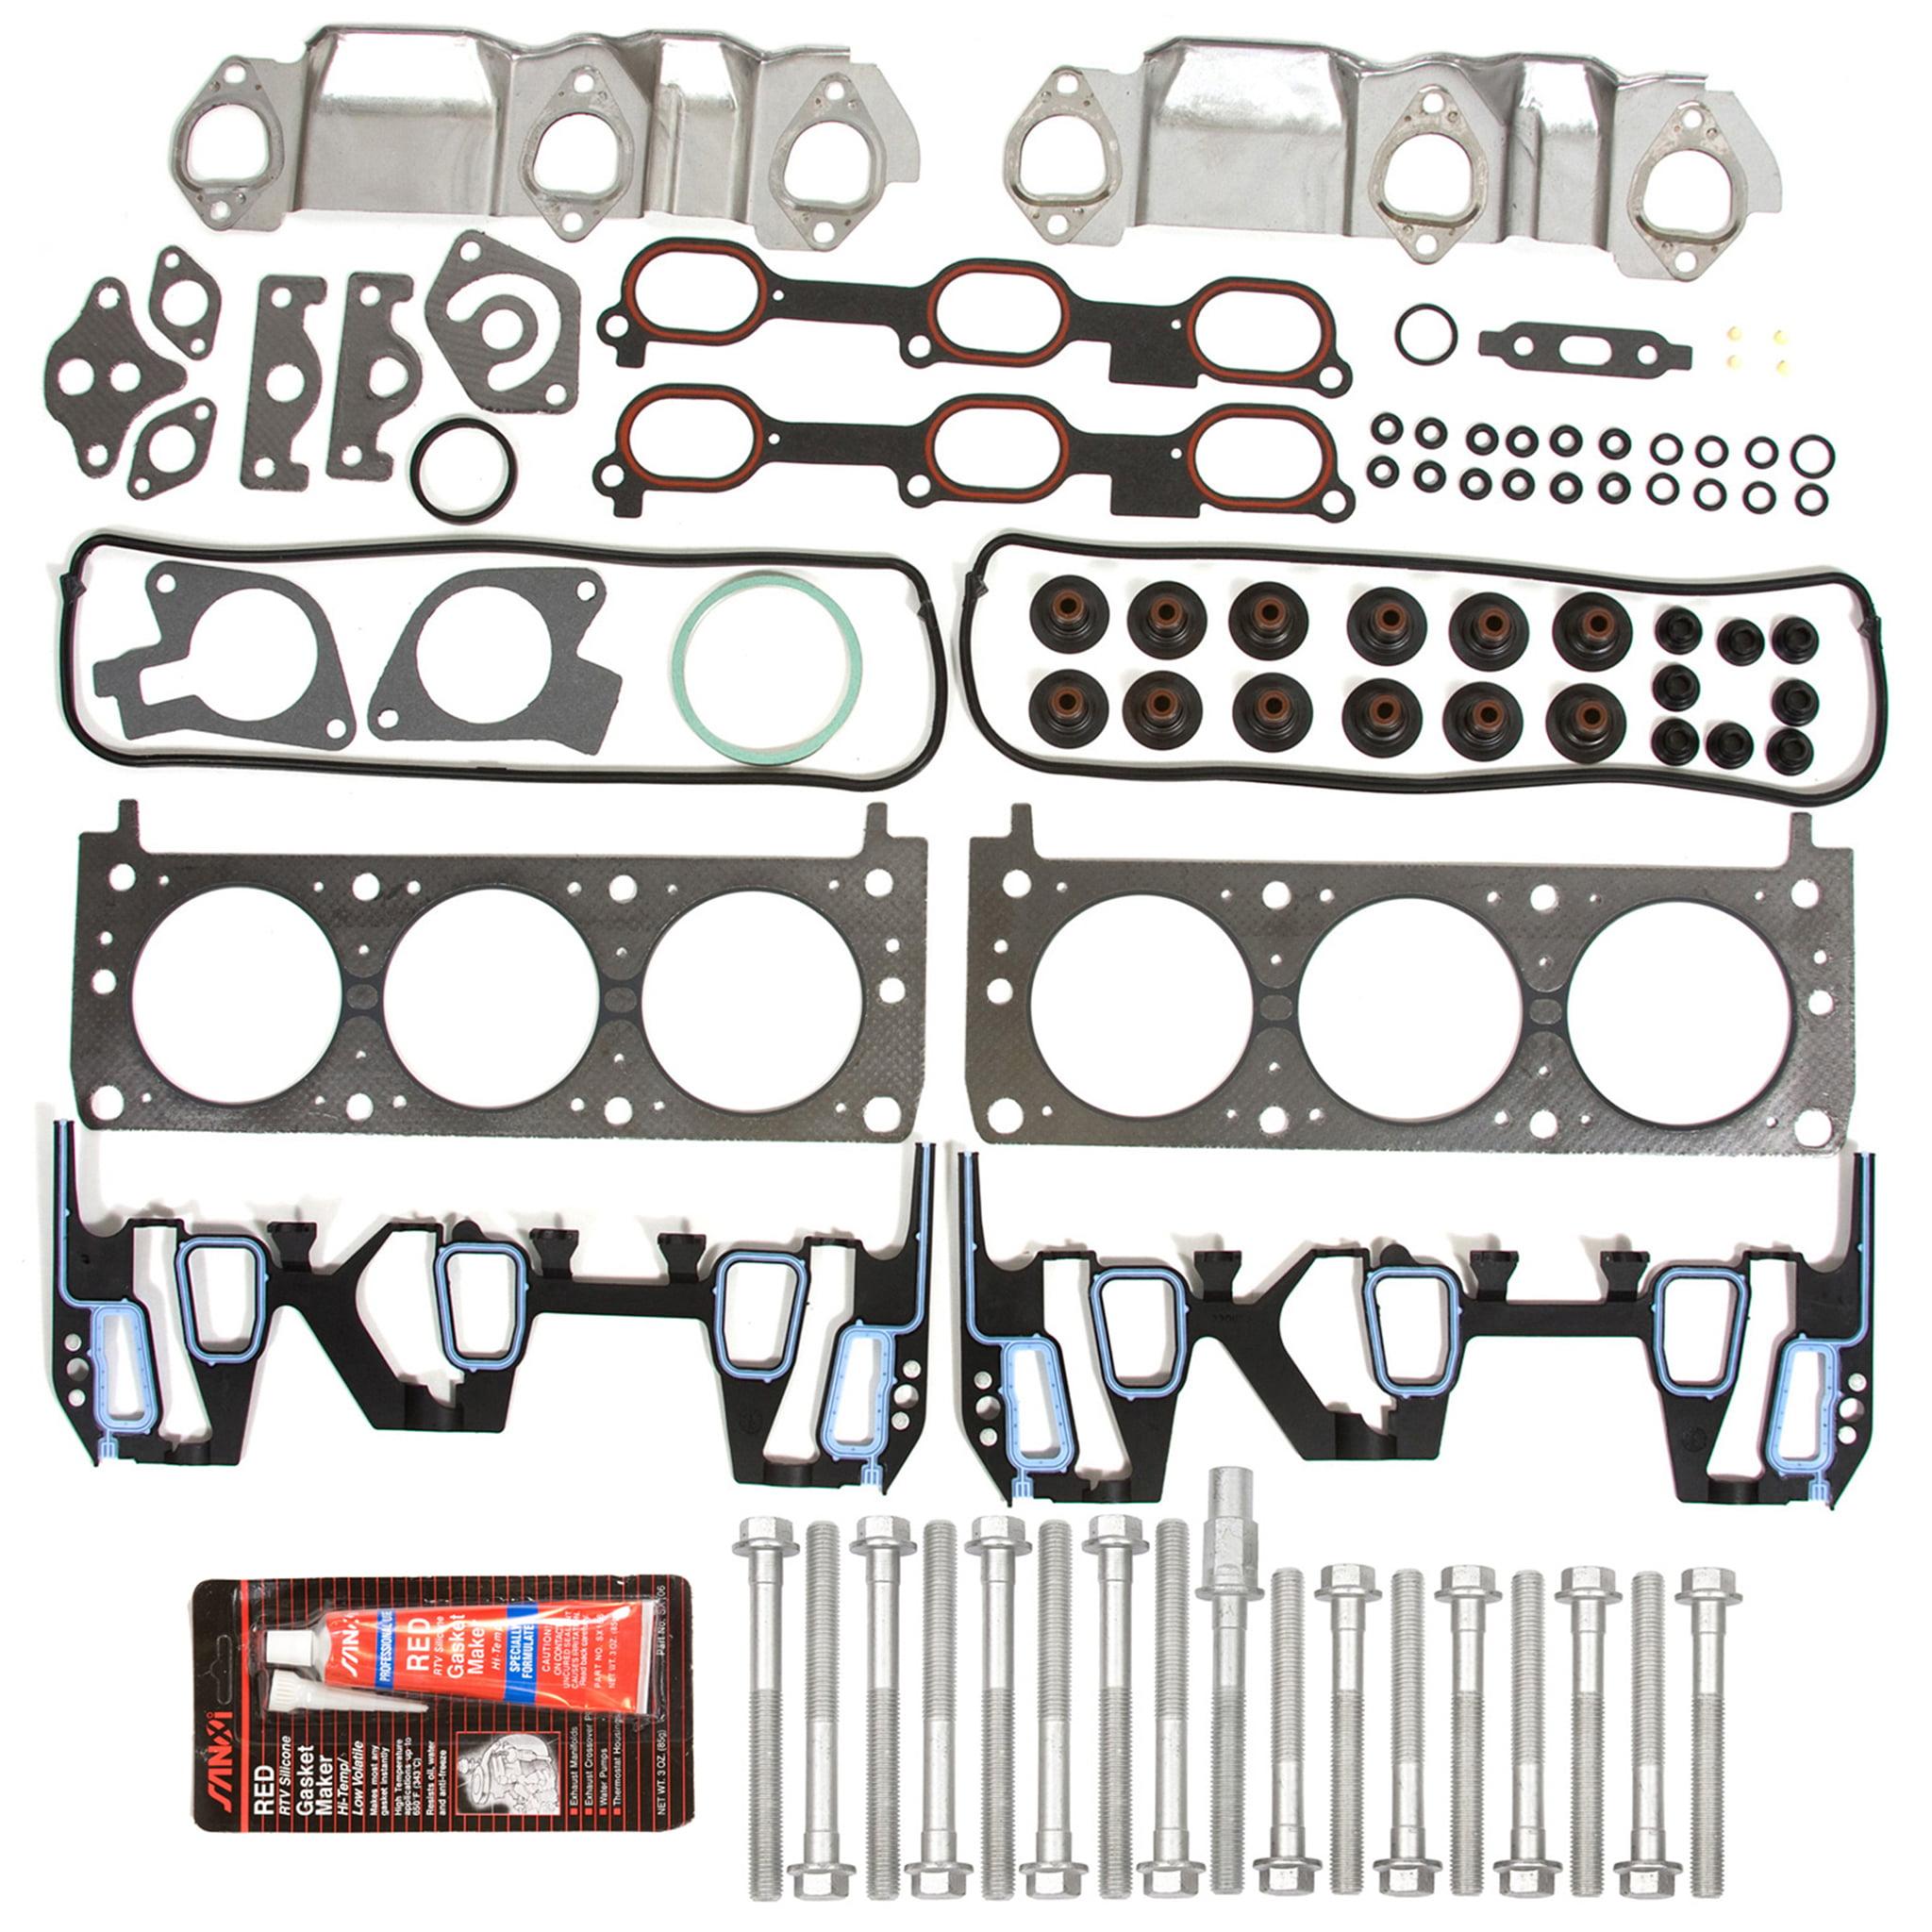 Engine Head Gasket Set Graphite for Buick Chevy Pontiac Oldsmobile V6 3.1L